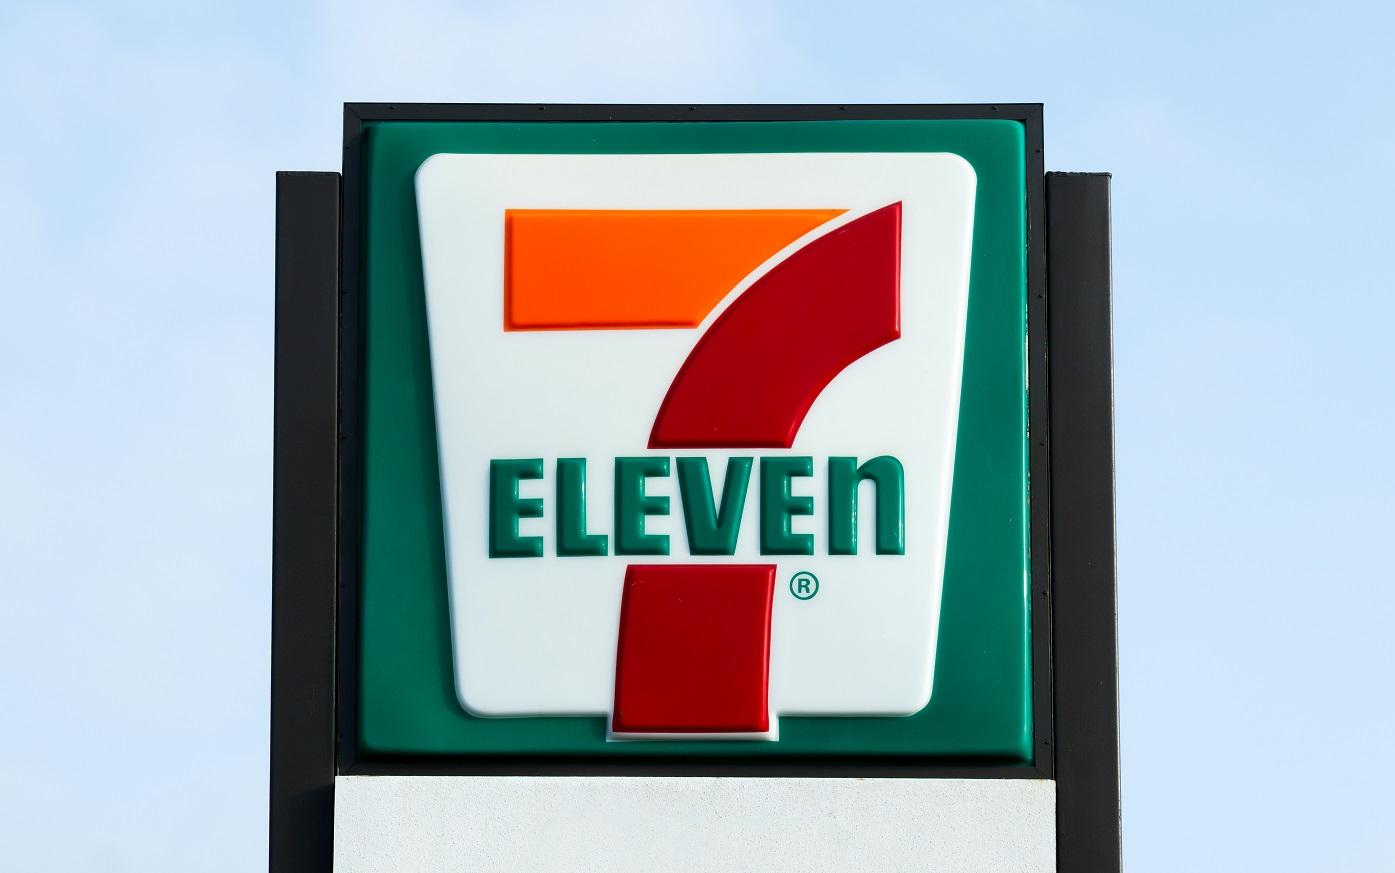 7-11 eleven